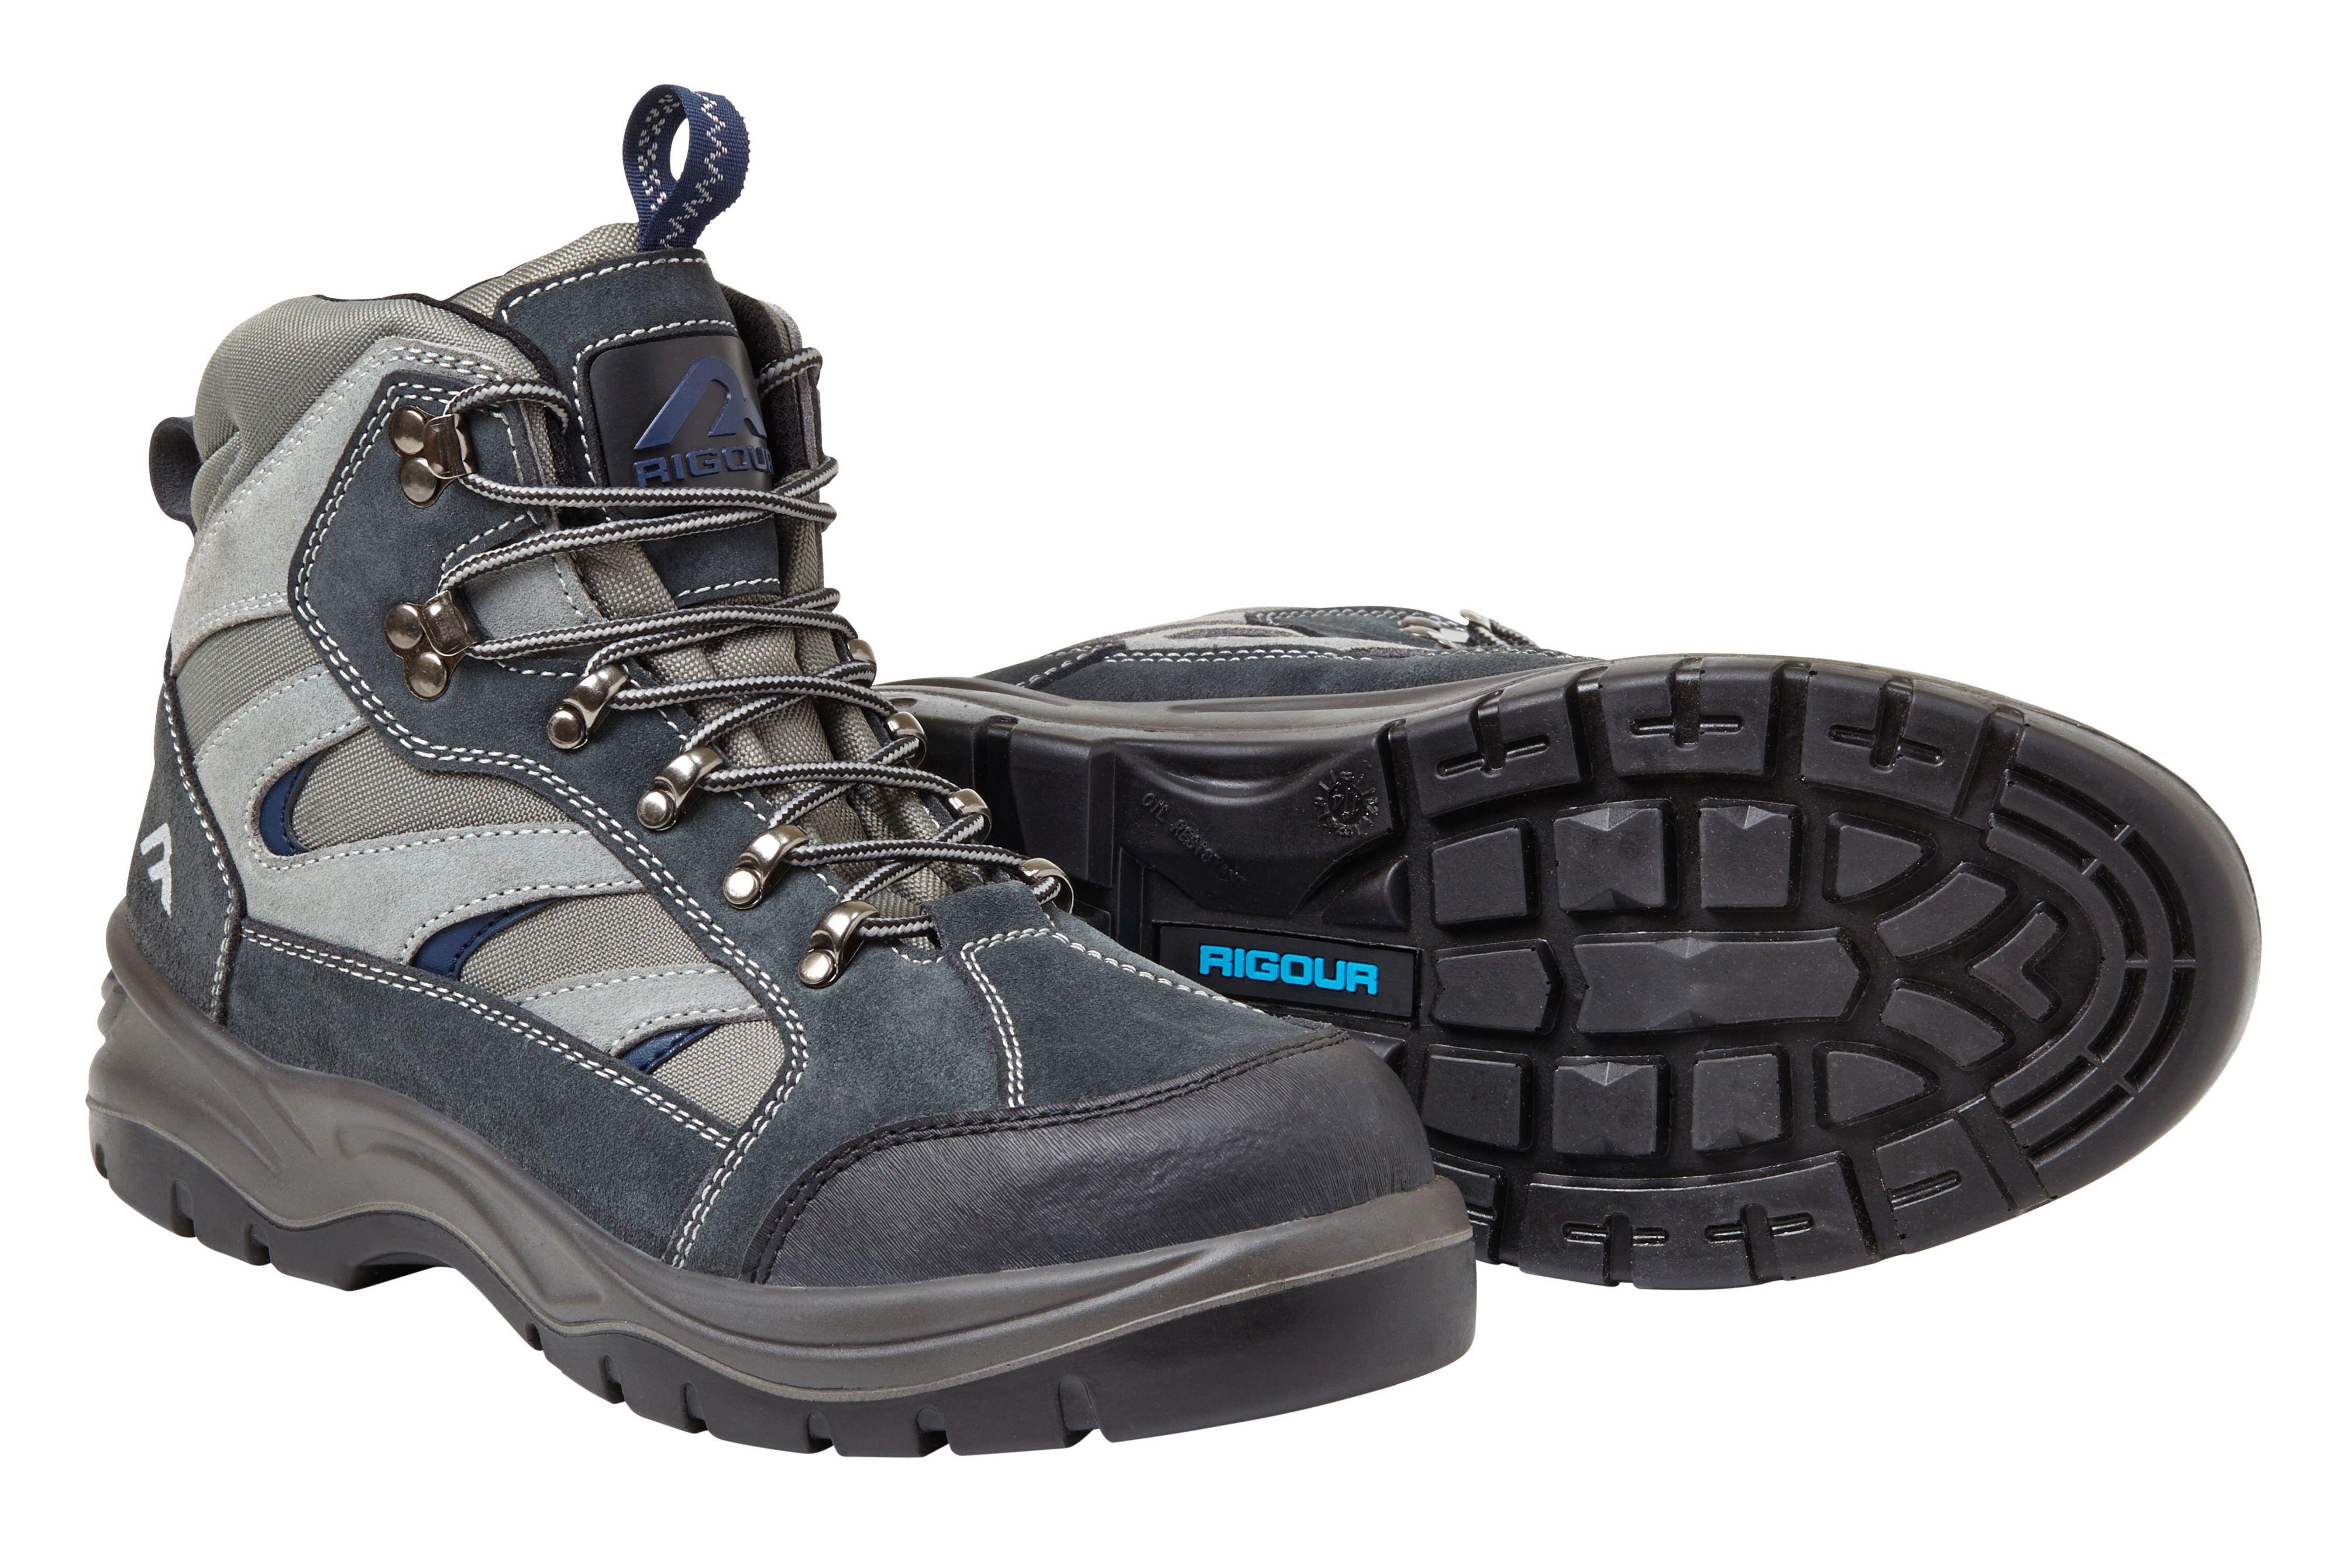 Rigour Grey & Blue Hiker Boots, Size 11